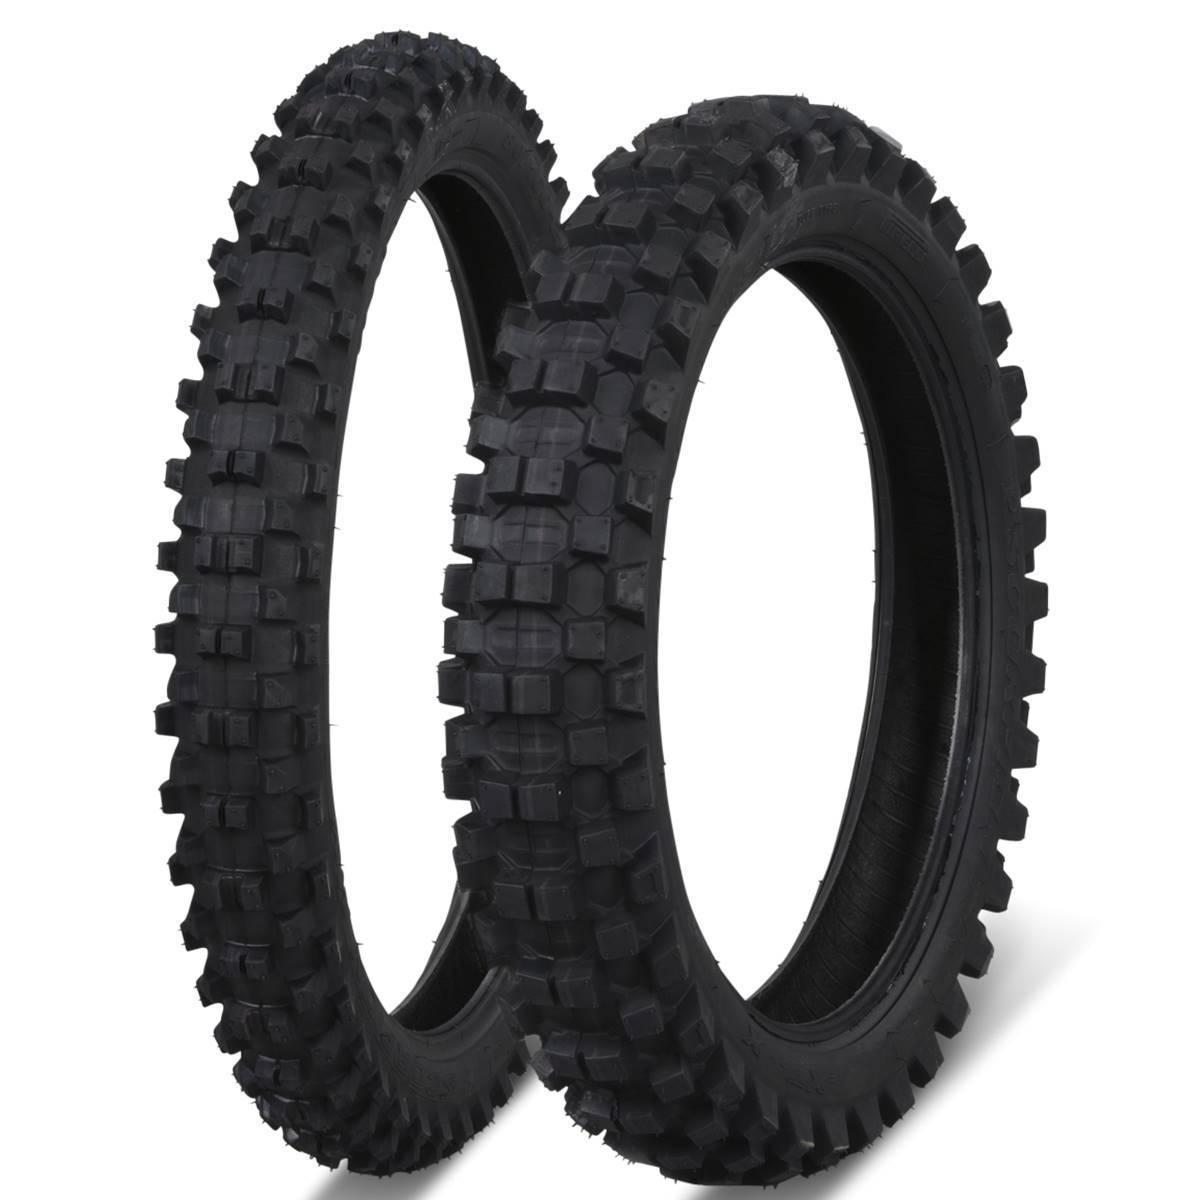 Pack neumaticos Pirelli Scorpion xrtra 80/100-21 + 100/100-18